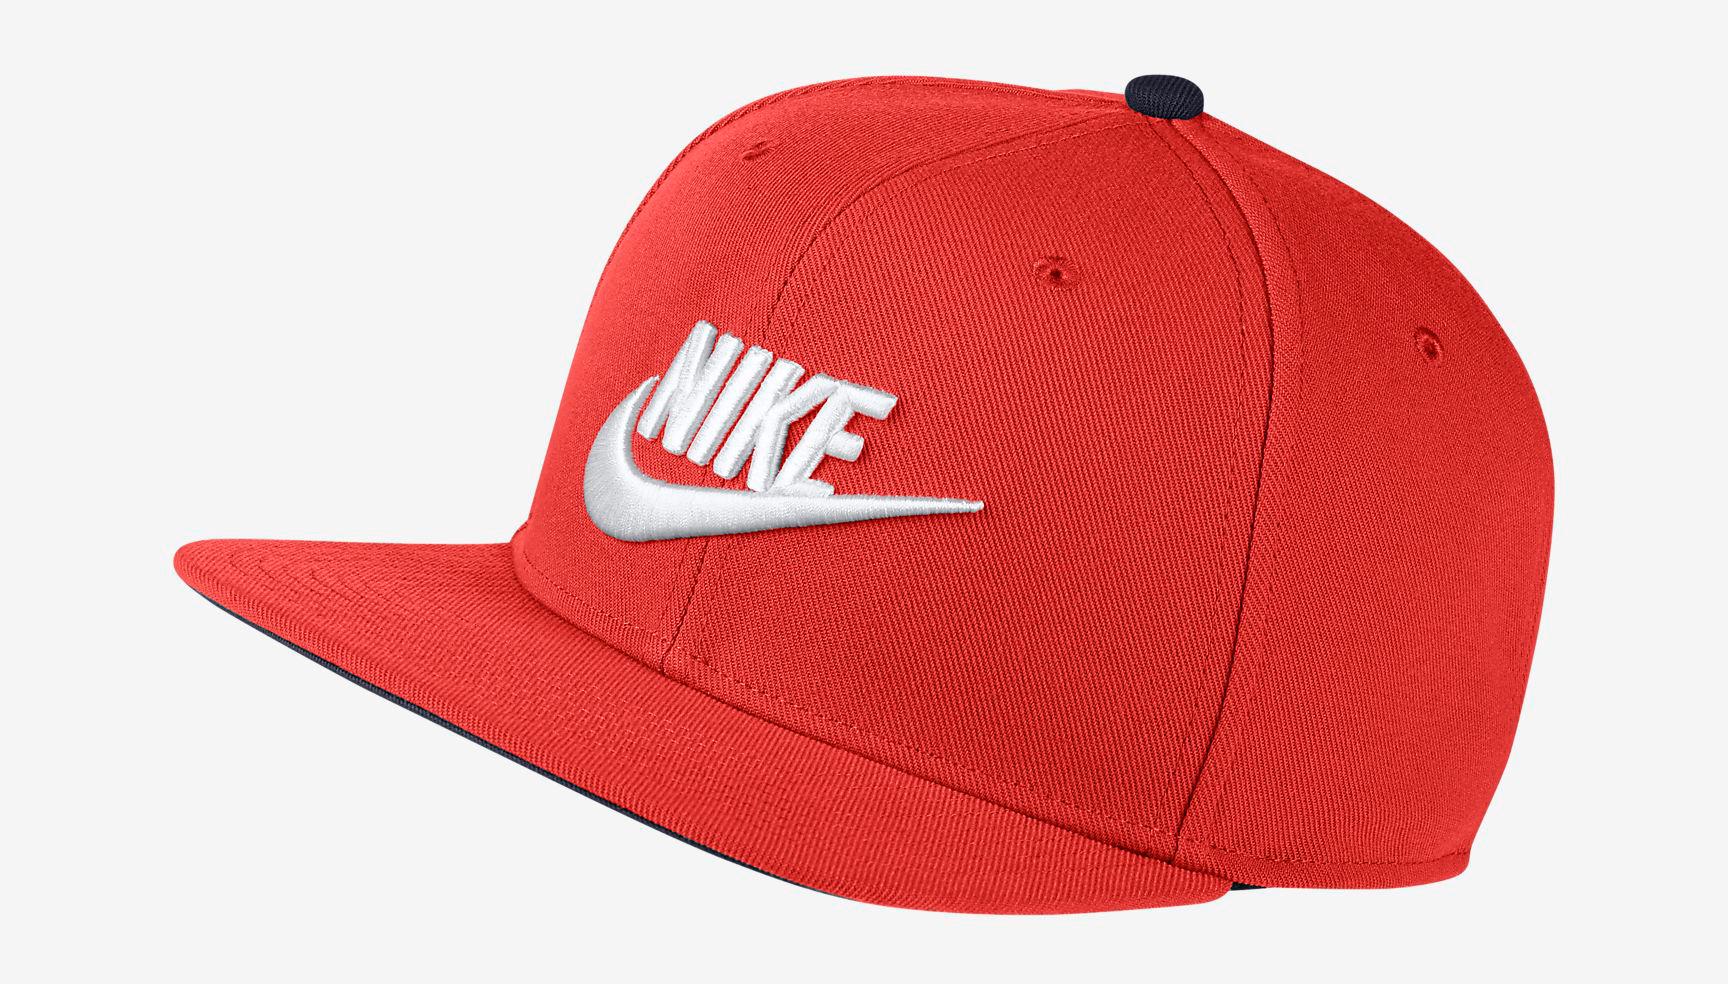 habanero-red-foamposite-nike-snapback-cap-1